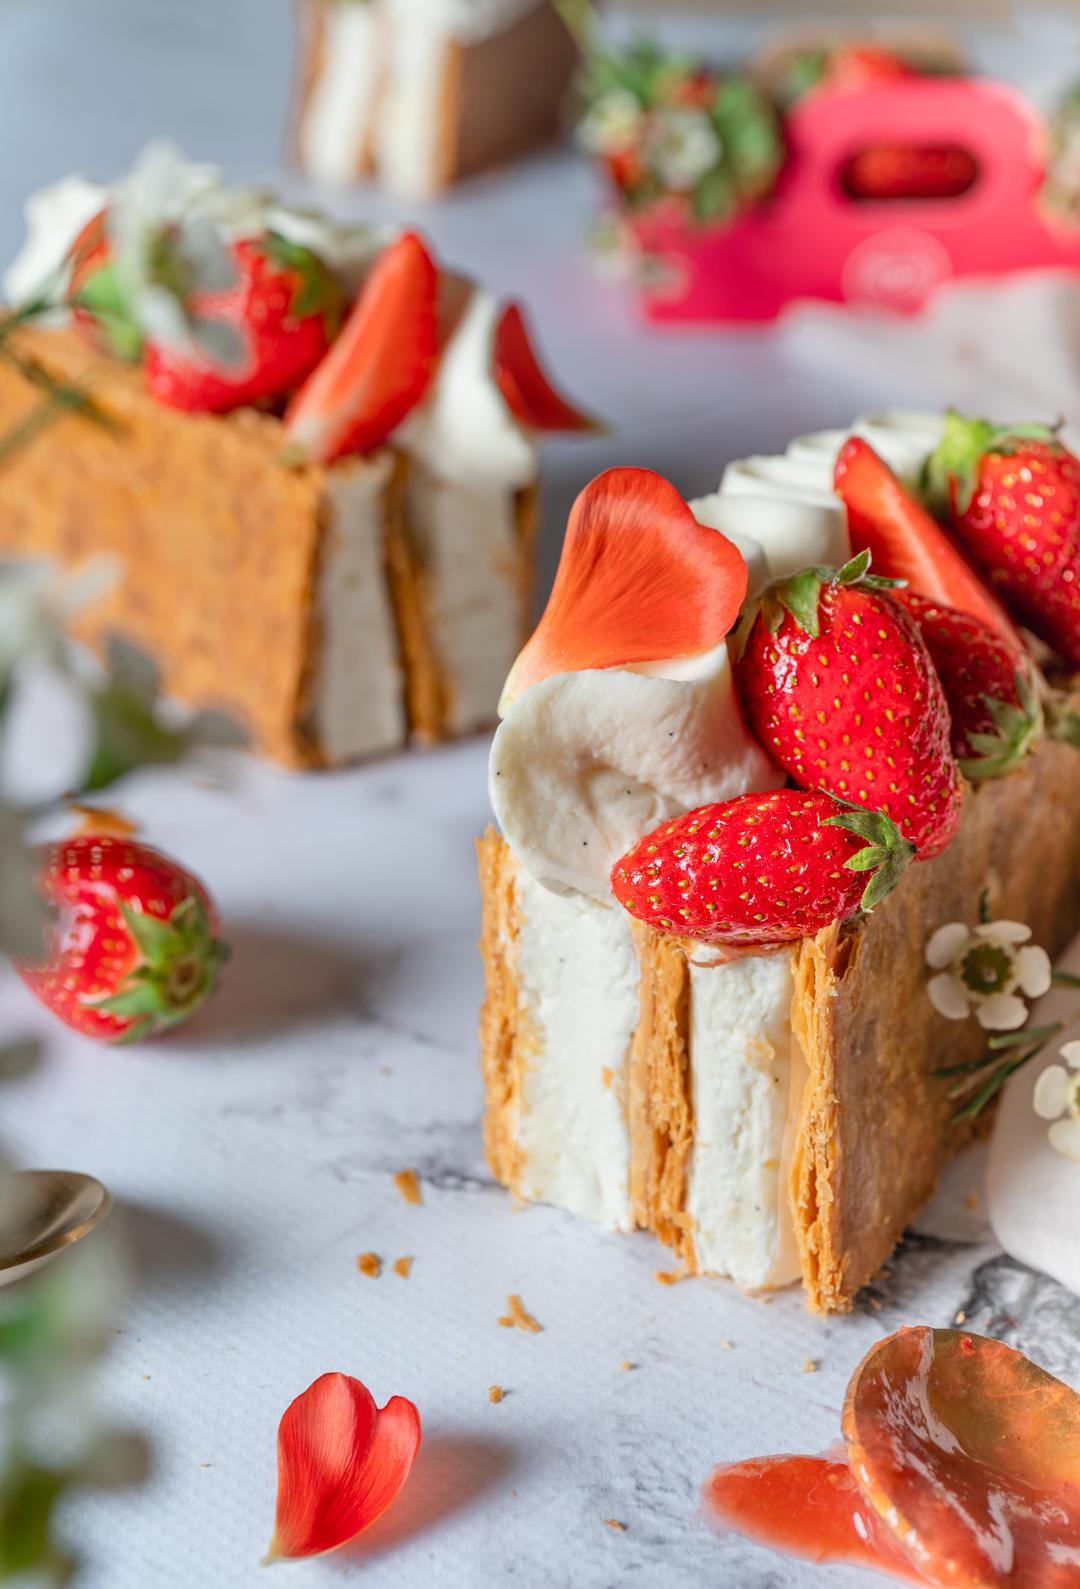 Recette Millefeuille vanille composée fraise rhubarbe